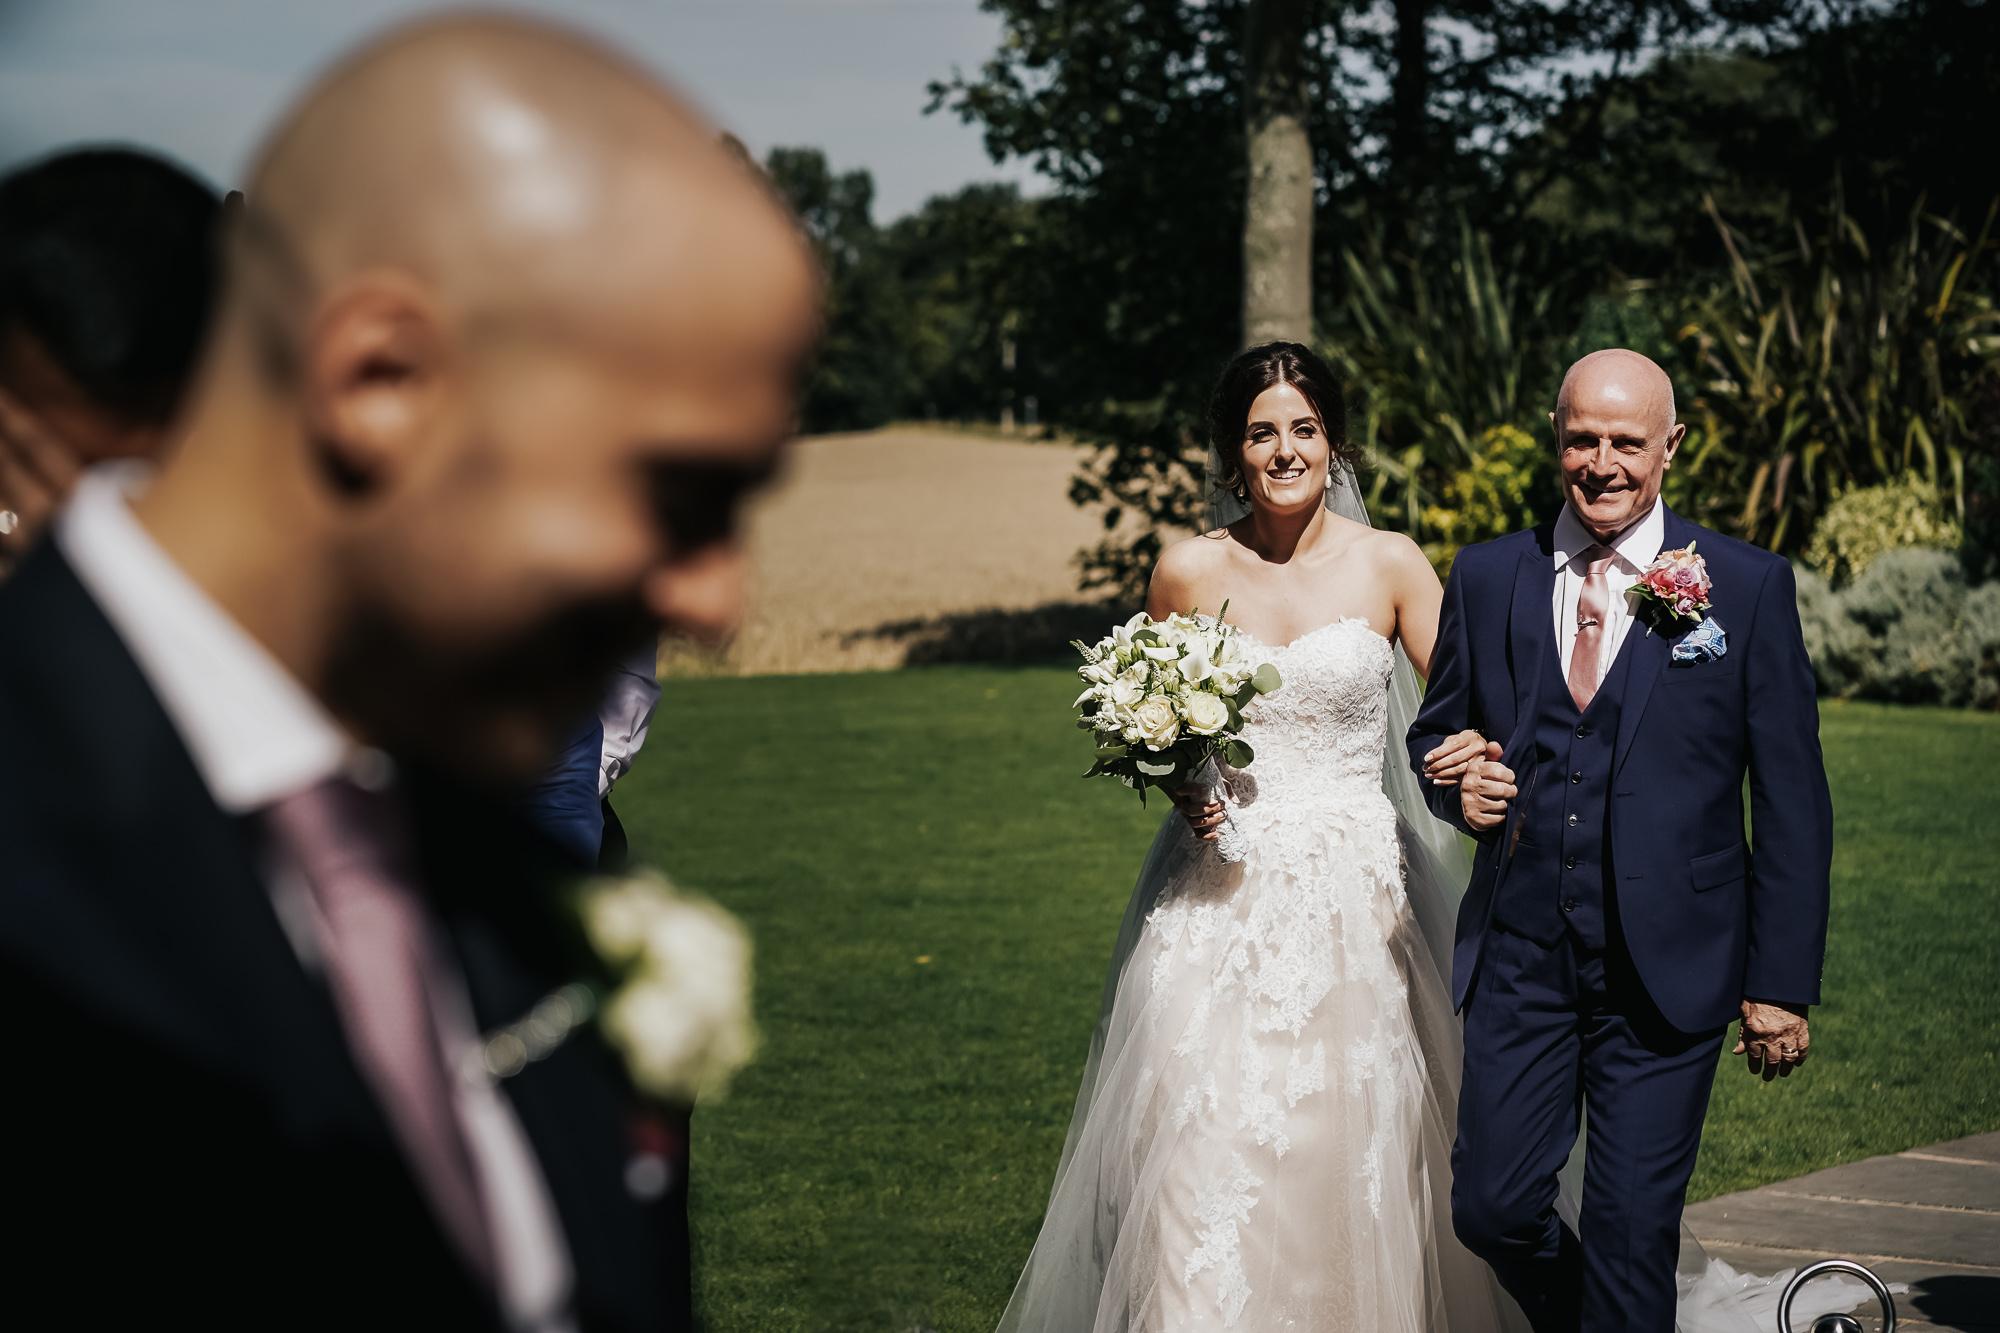 West Tower Wedding Venue Orkskirk Lancashire Wedding Photography cheshire wedding photographer (13 of 47).jpg